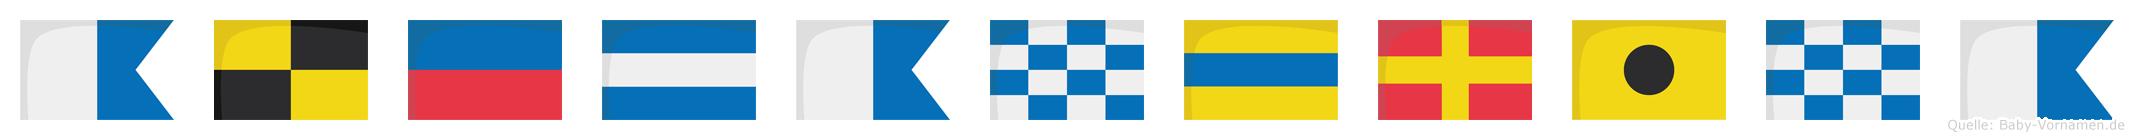 Alejandrina im Flaggenalphabet